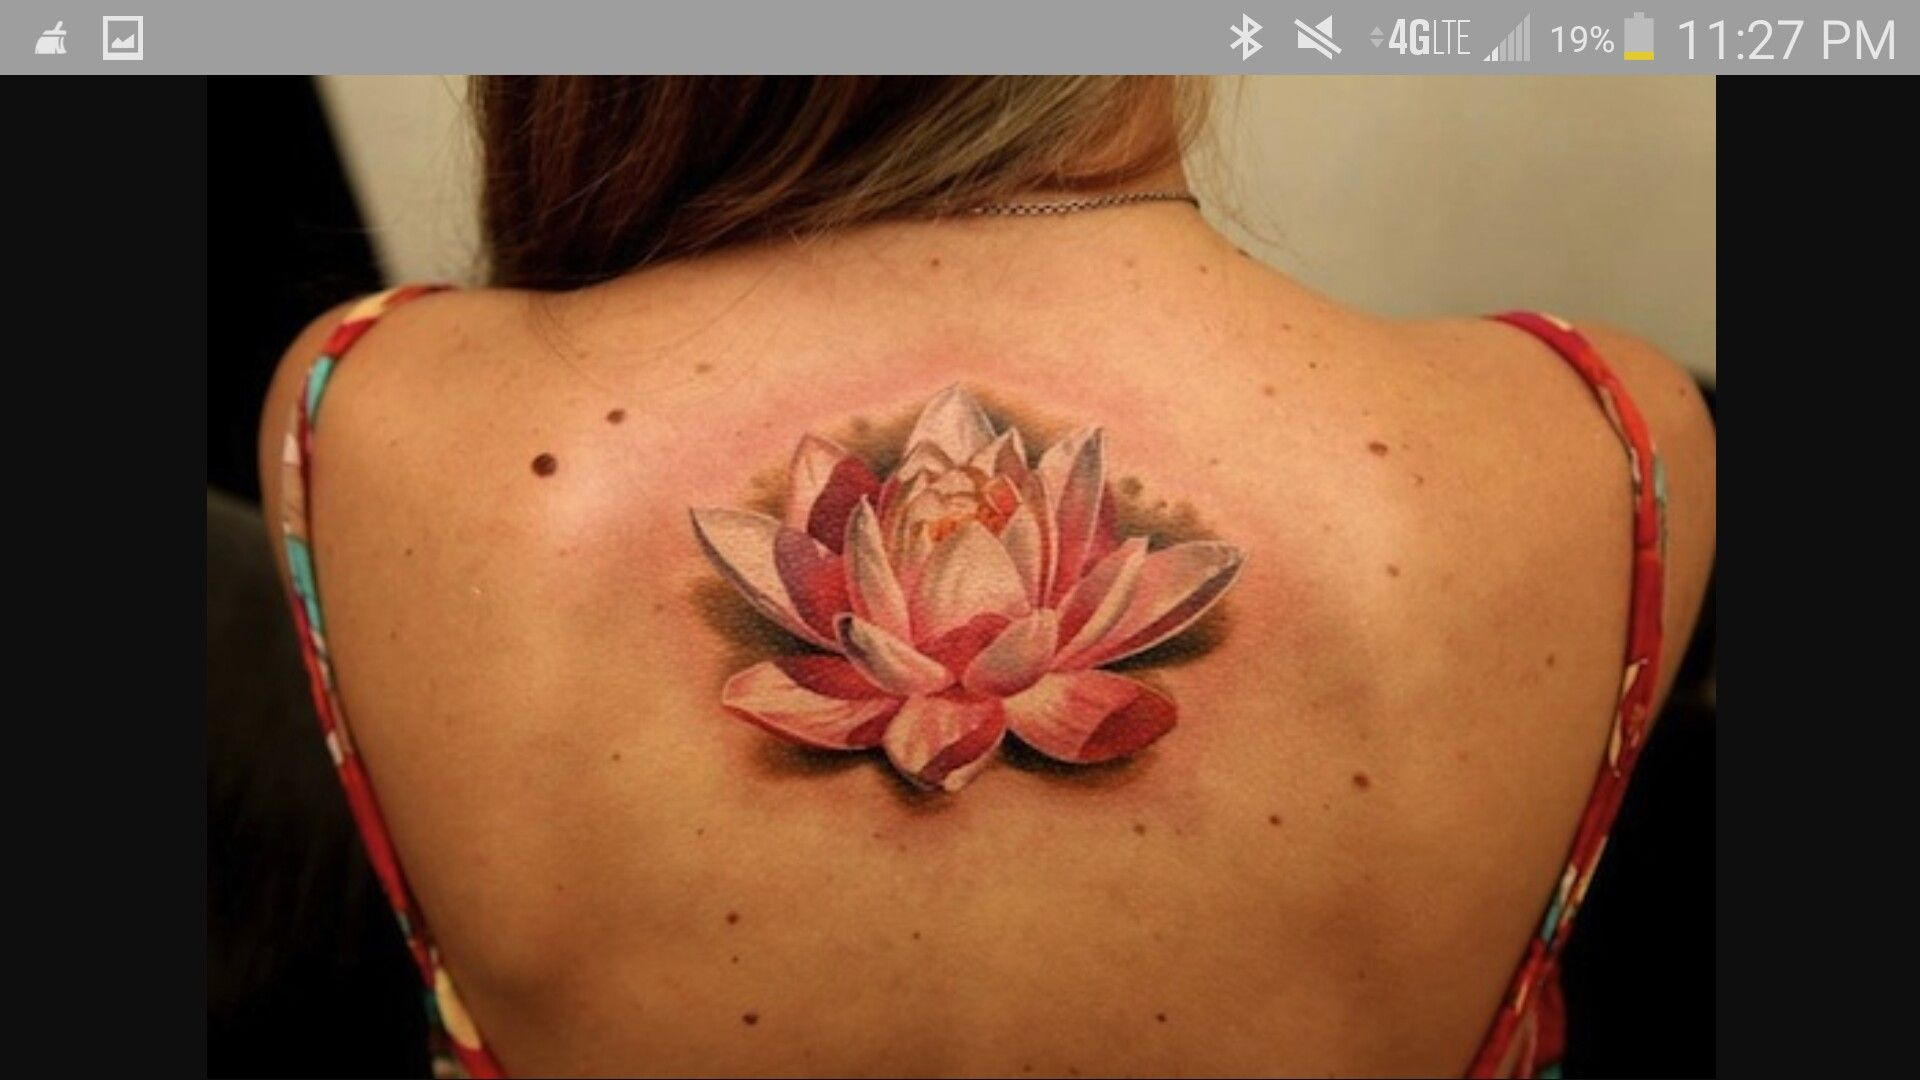 Pin By Mario Orejel On Tattoo White Lotus Tattoo Water Lily Tattoos Red Lotus Tattoo